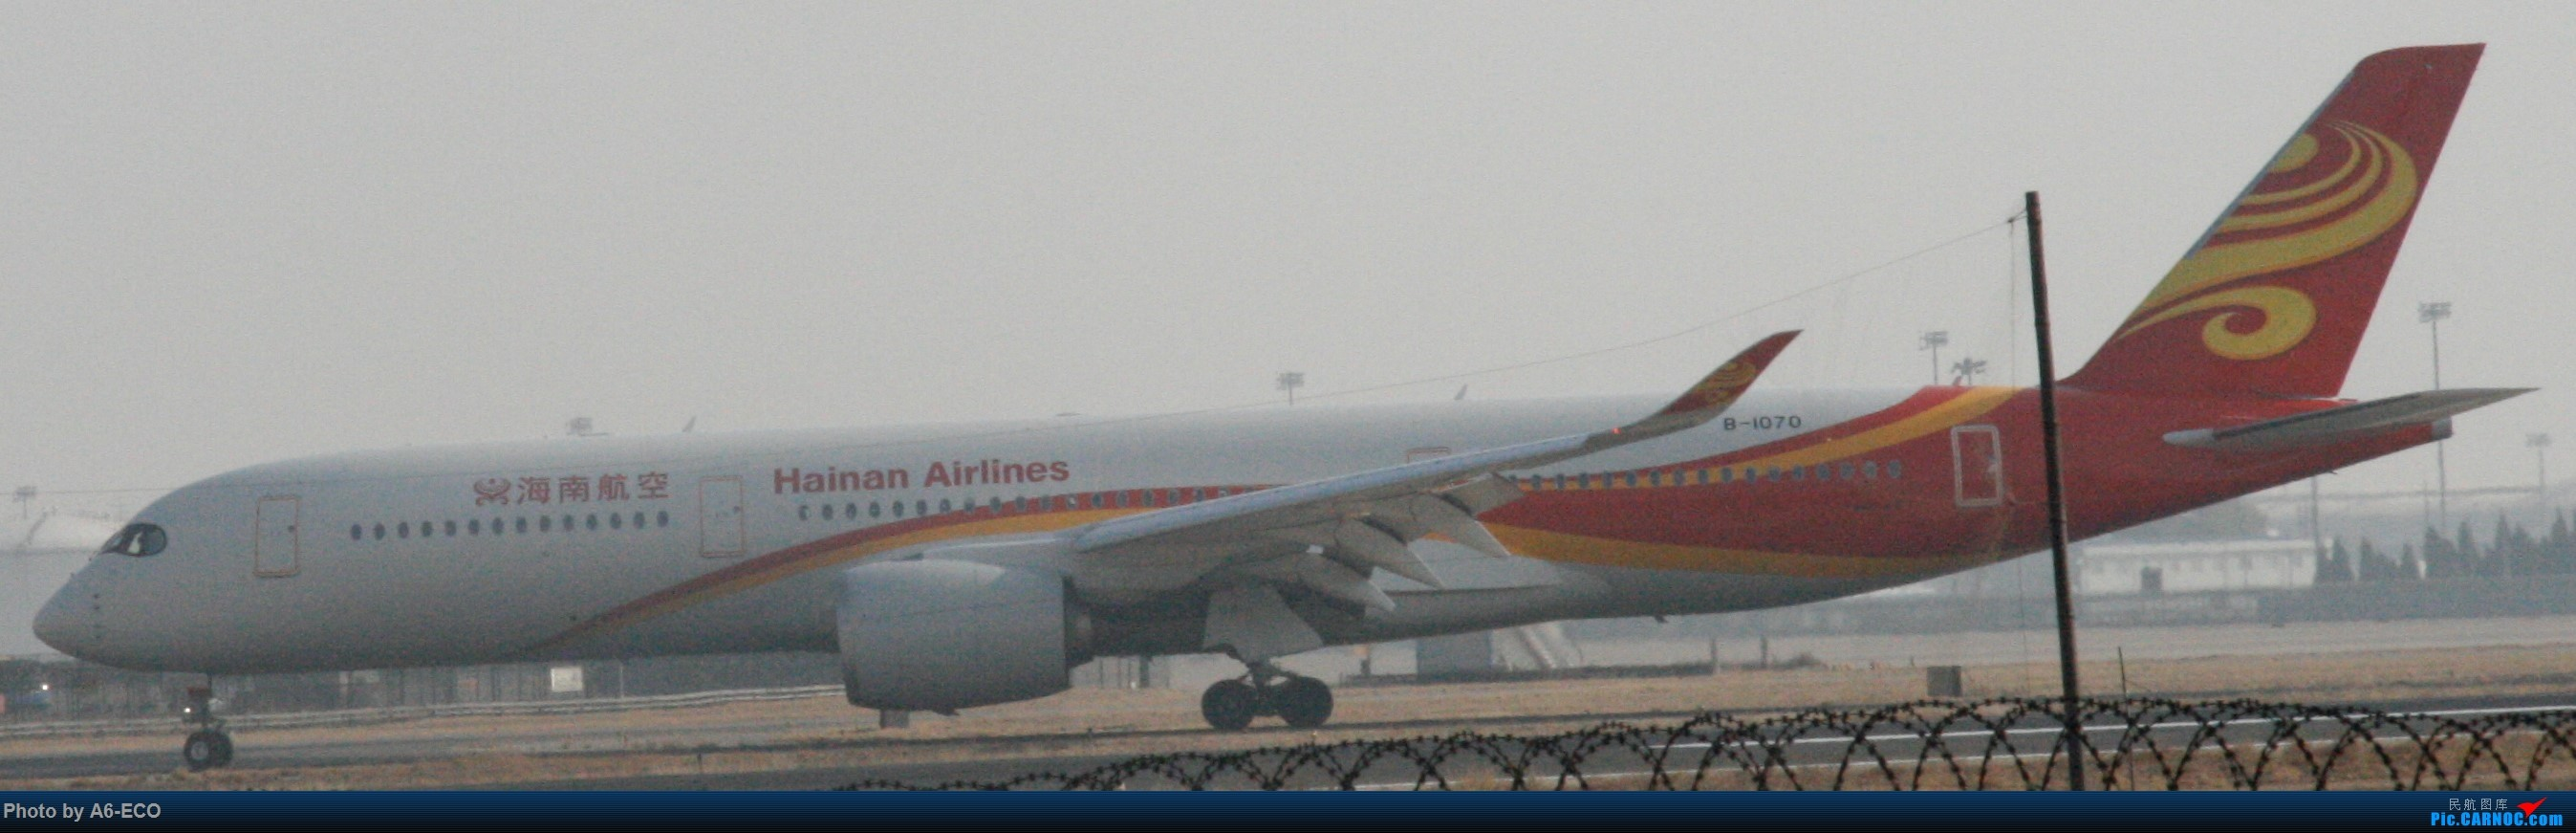 Re:[原创]今天运气极好,云南孔雀,B-1070,2个菜航邮戳,泡菜航彩绘,东航邮戳...... AIRBUS A350-900 B-1070 中国北京首都国际机场